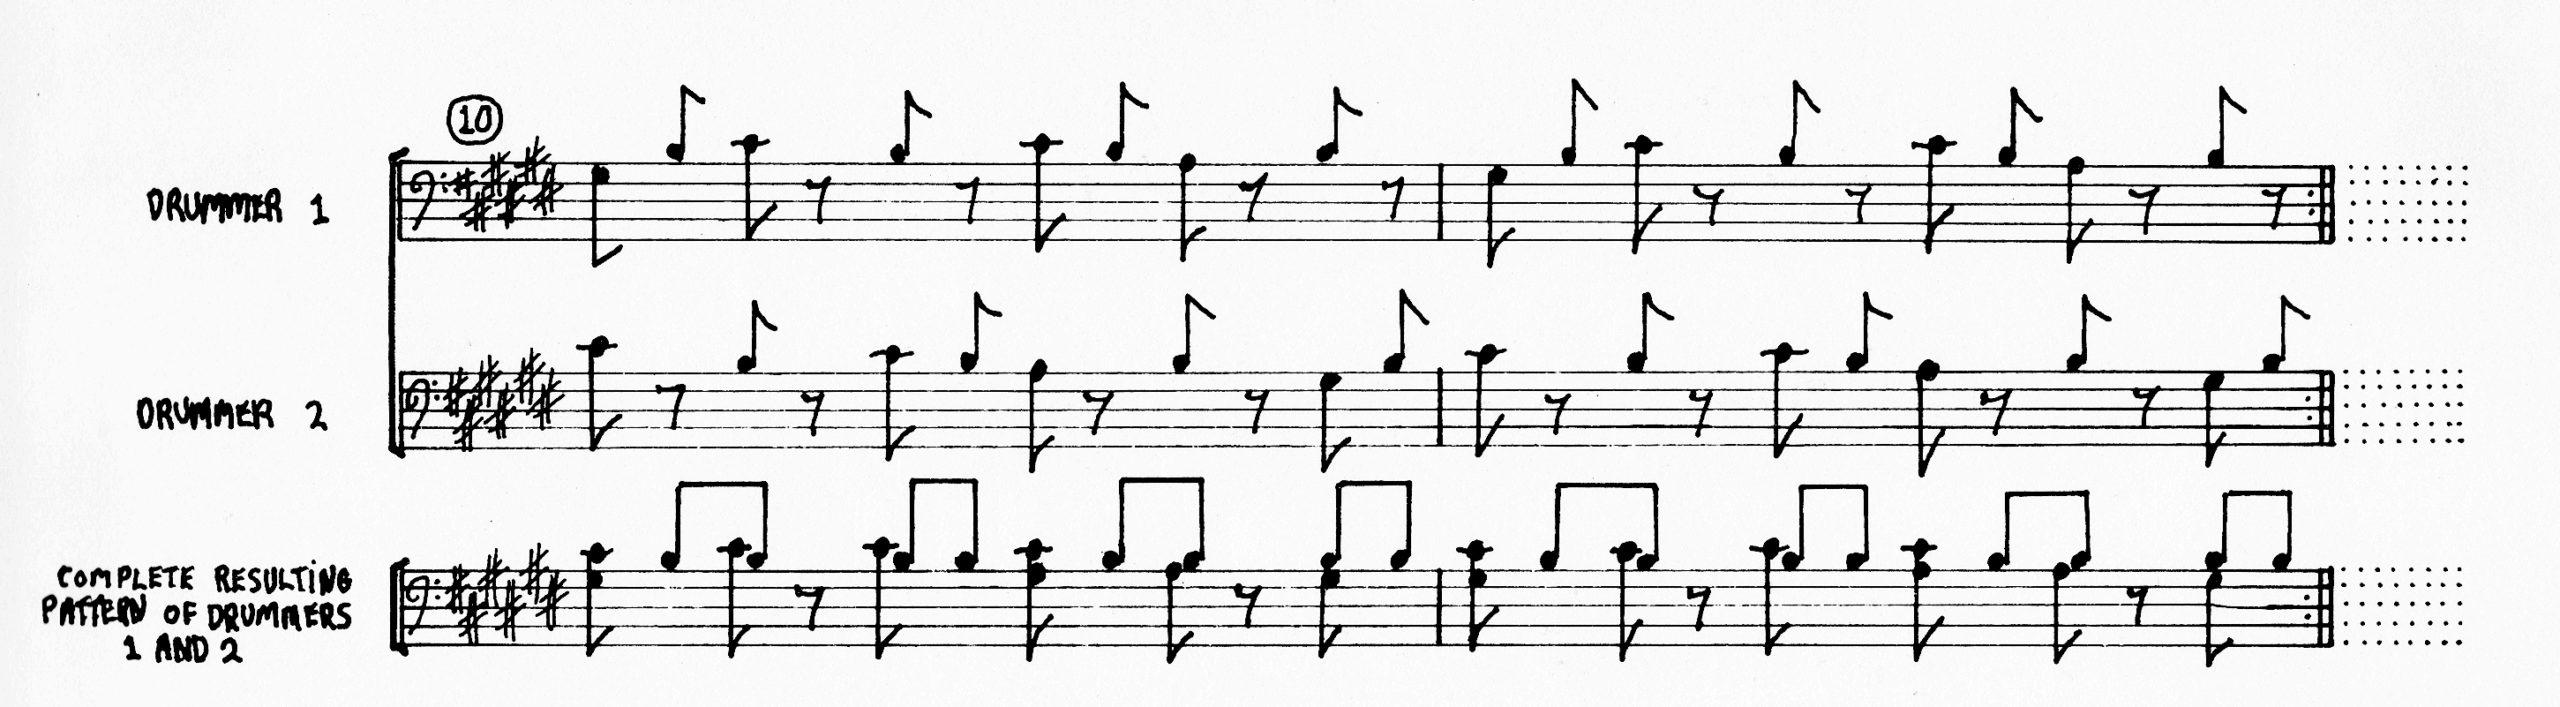 Figure 1. Excerpt from Drumming Part I